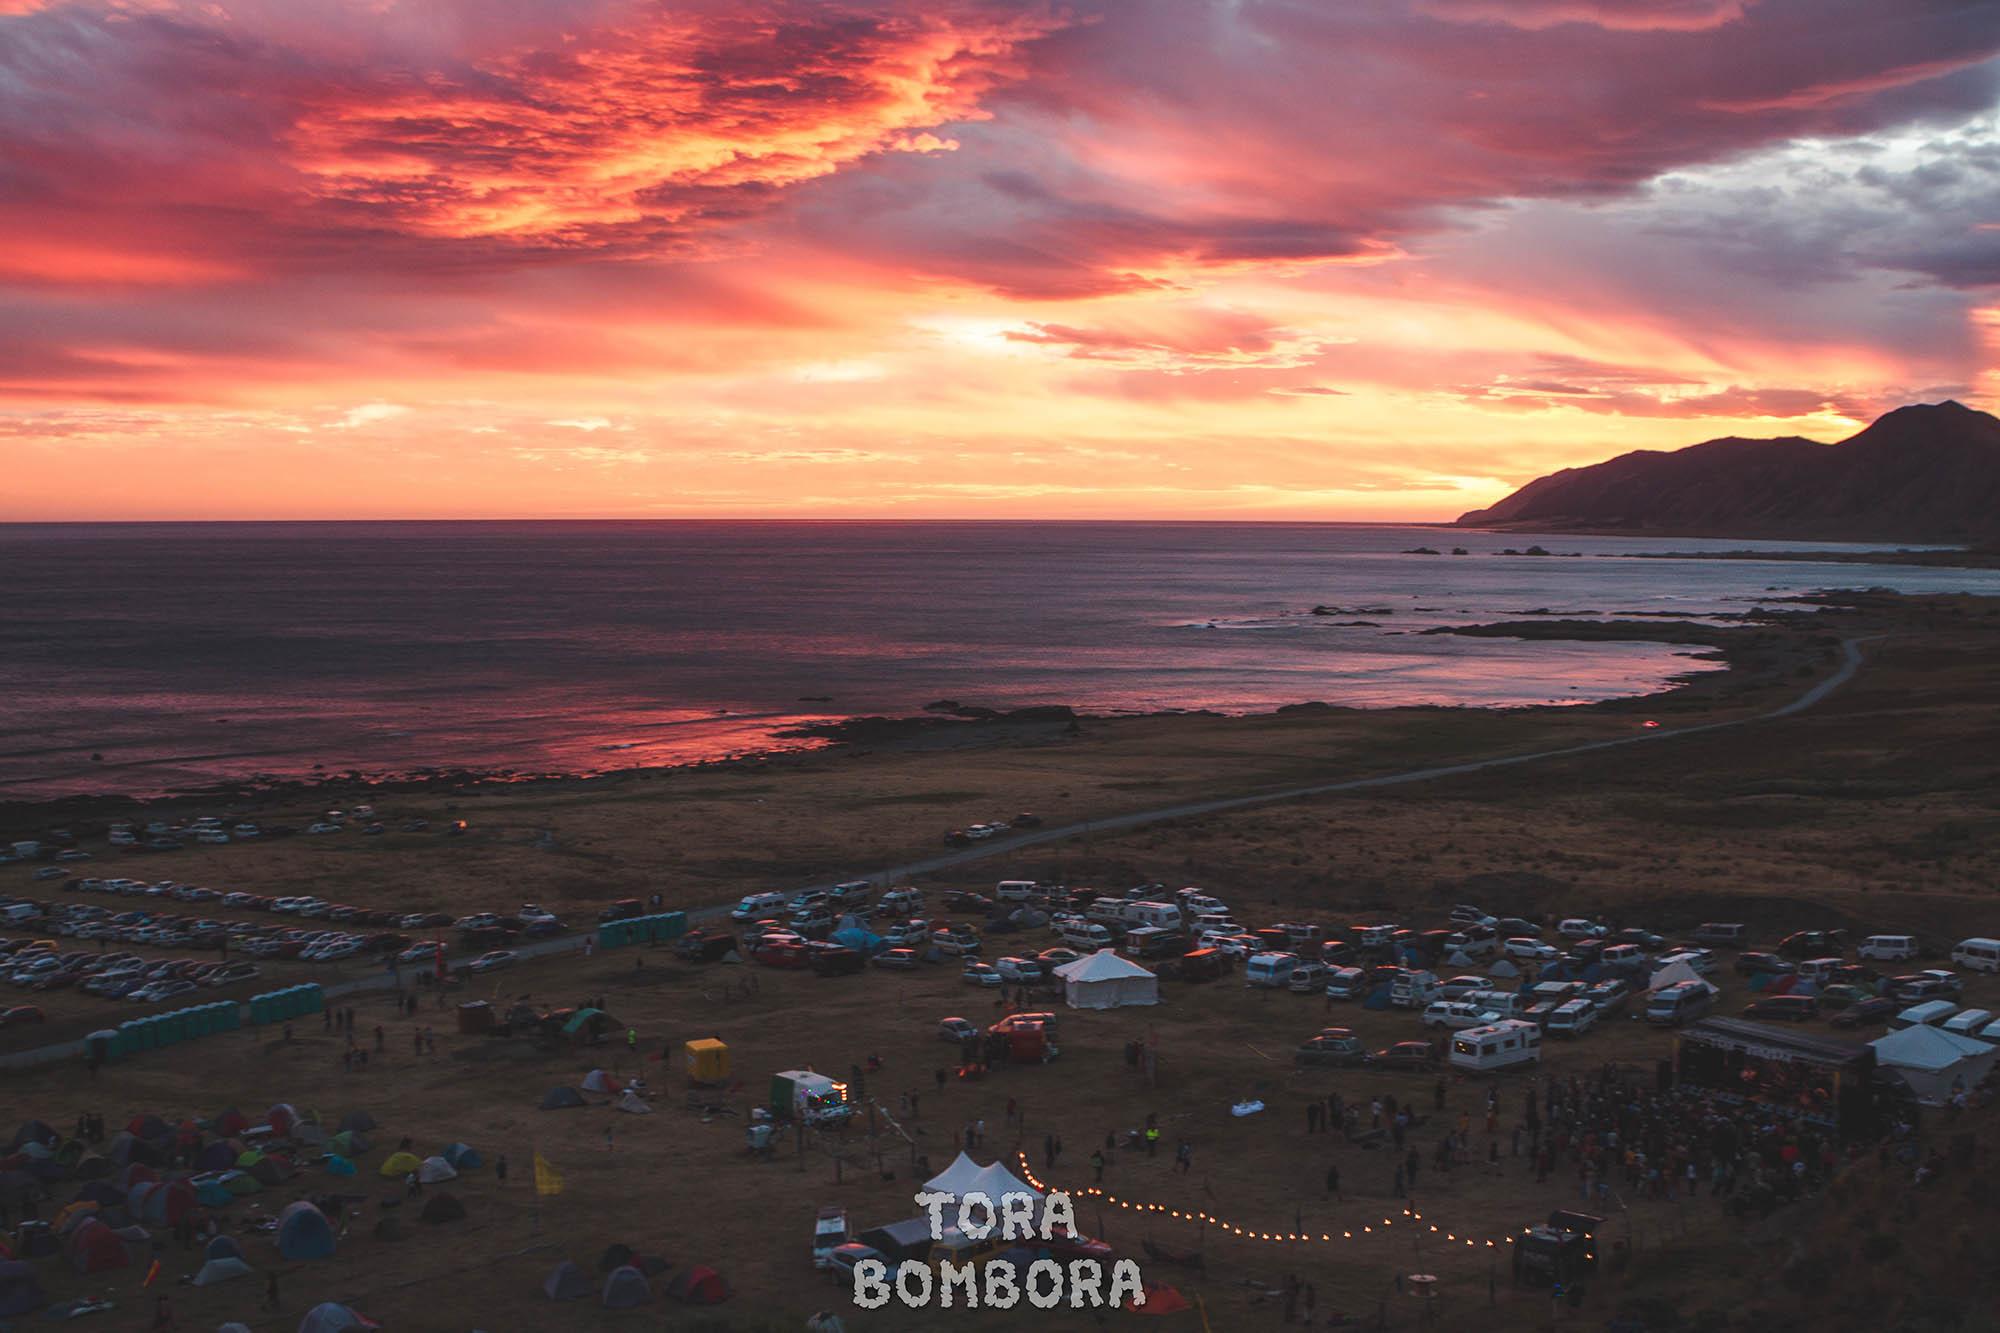 Tora Bombora